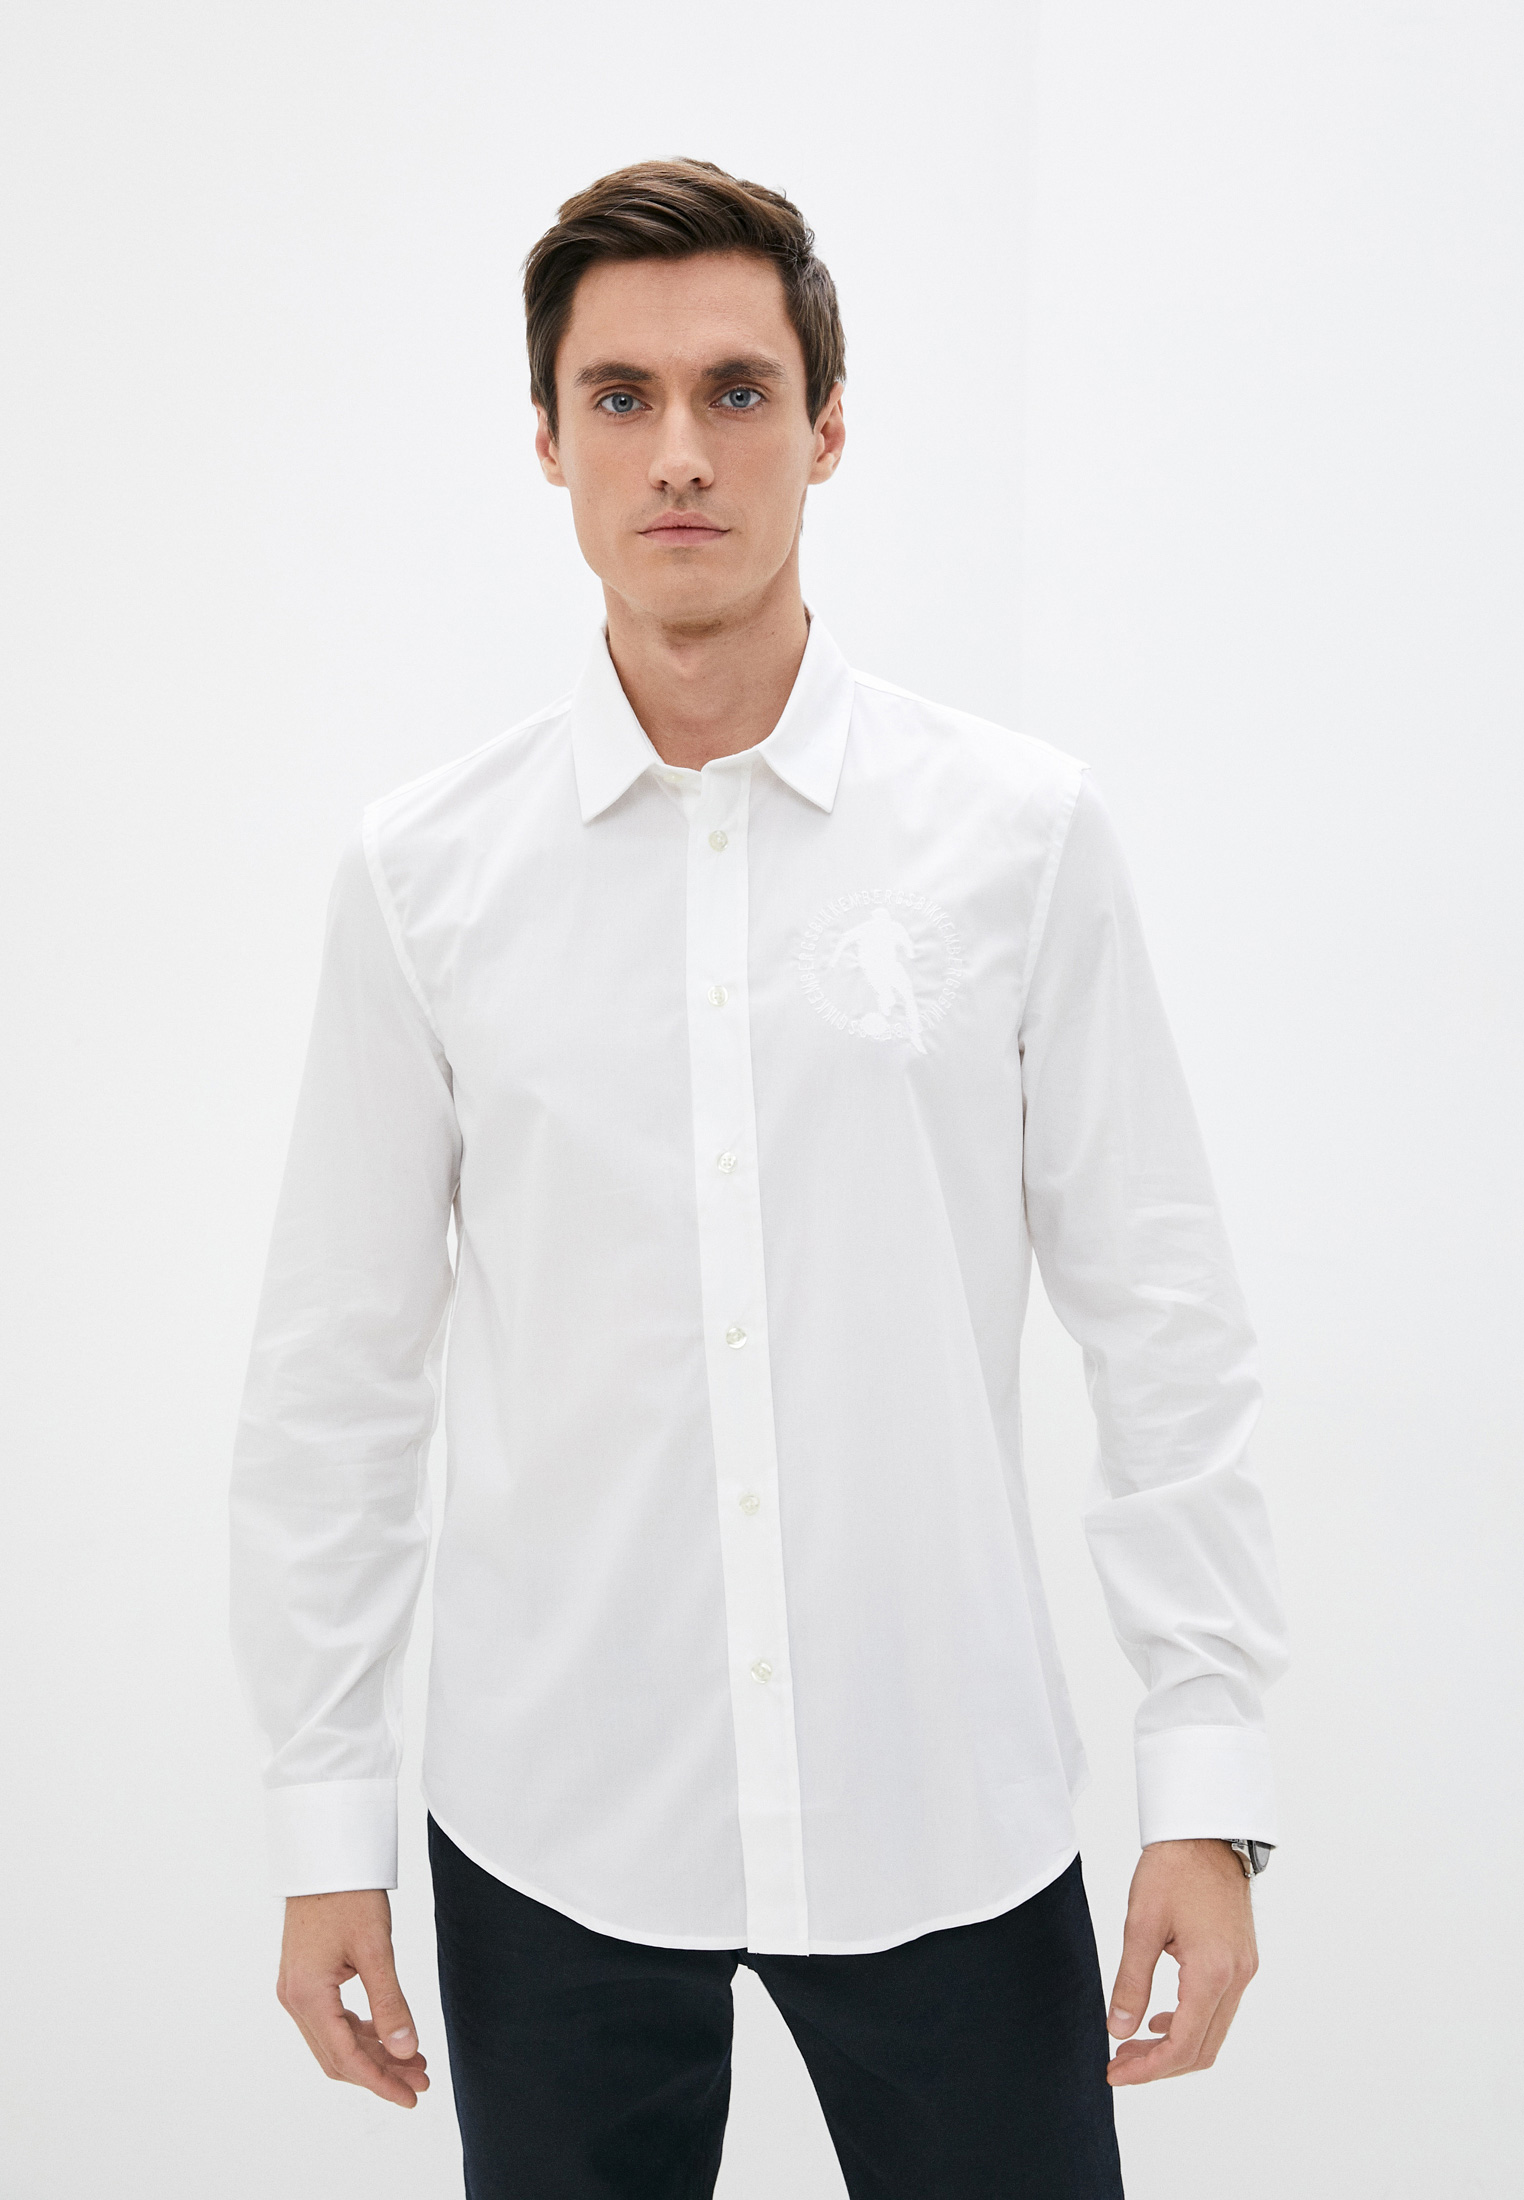 Рубашка с длинным рукавом Bikkembergs (Биккембергс) C C 009 2C S 2931: изображение 11